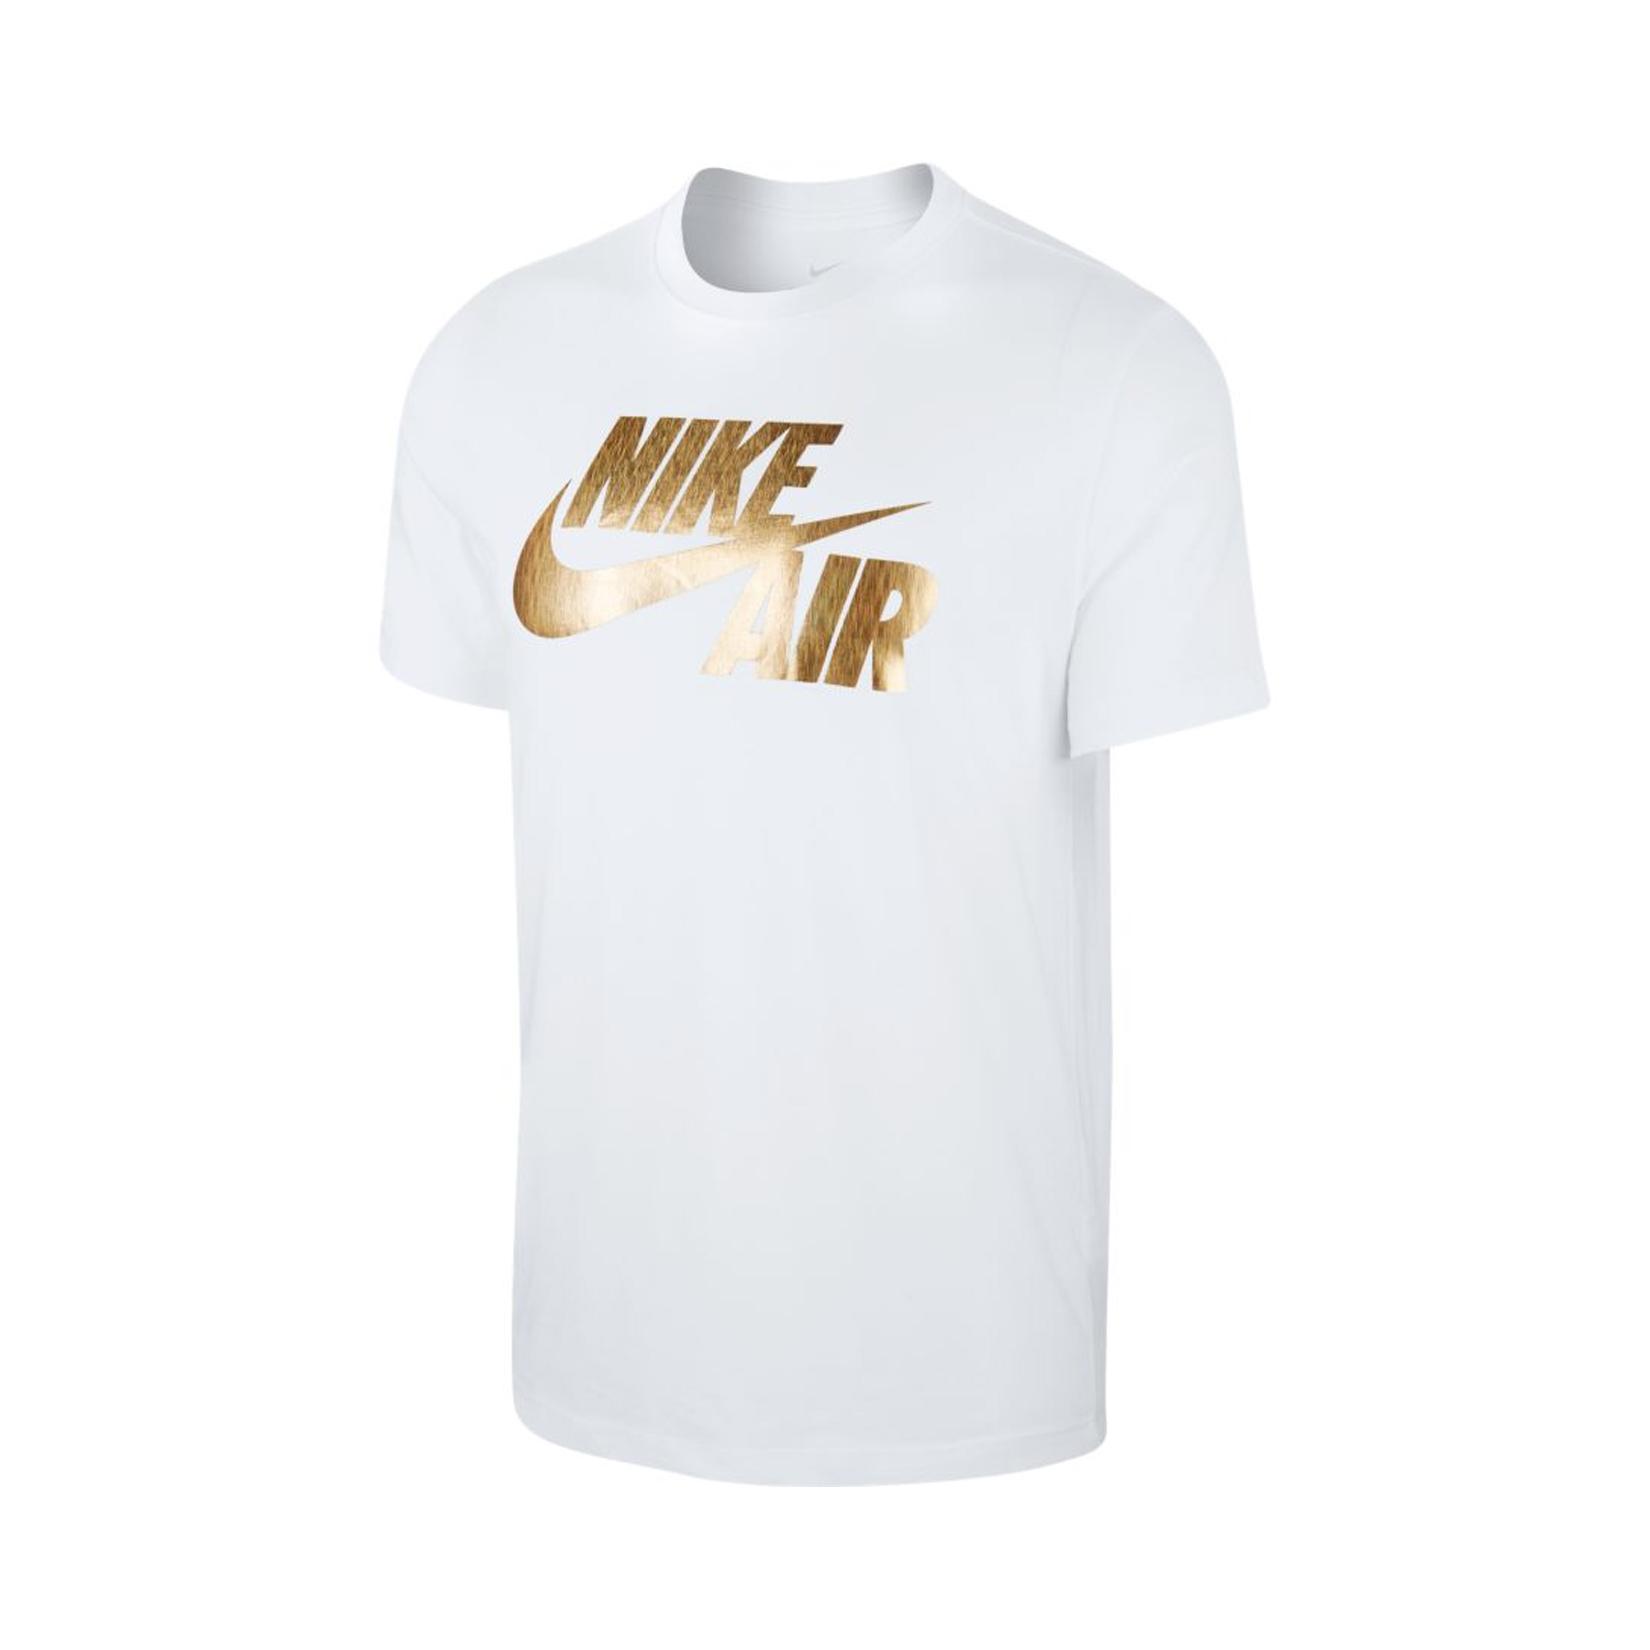 Nike Sportswear Preheat T-Shirt White - Gold